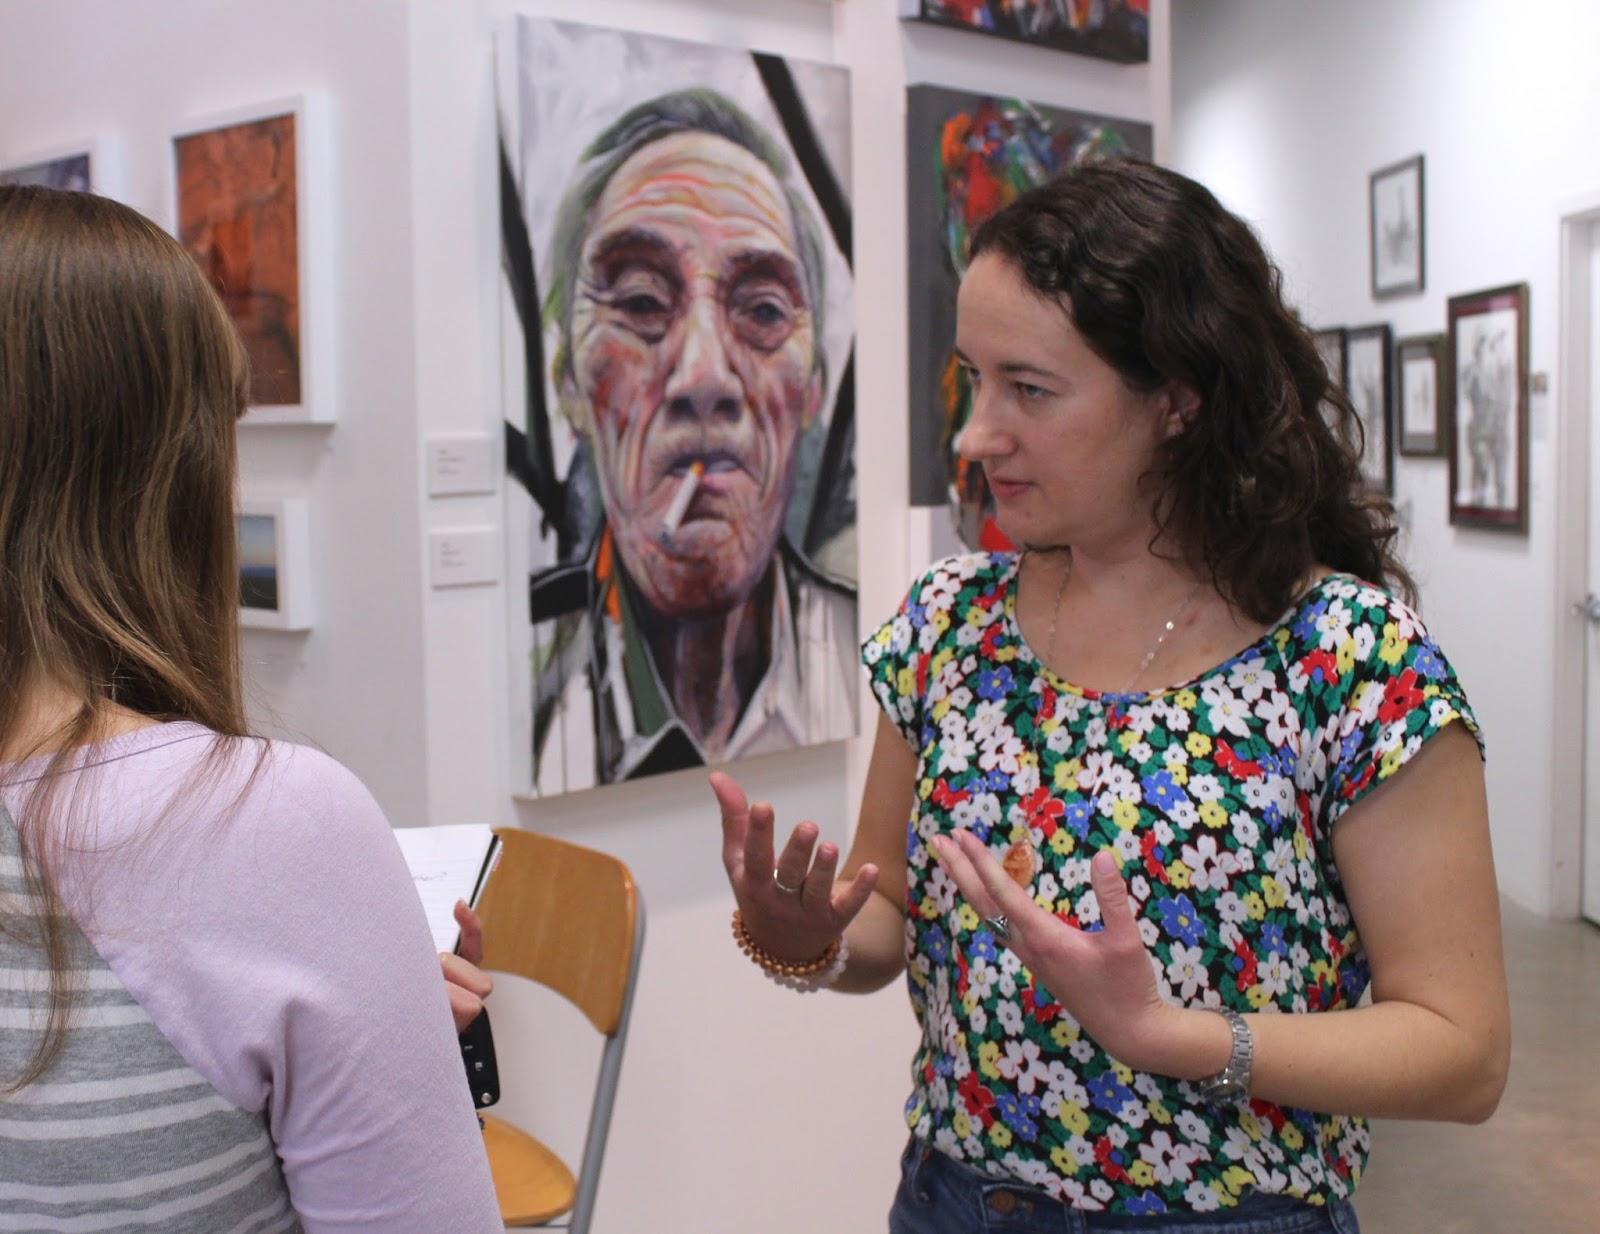 Laura Bath Turner explains the inspiration behind her photographs.